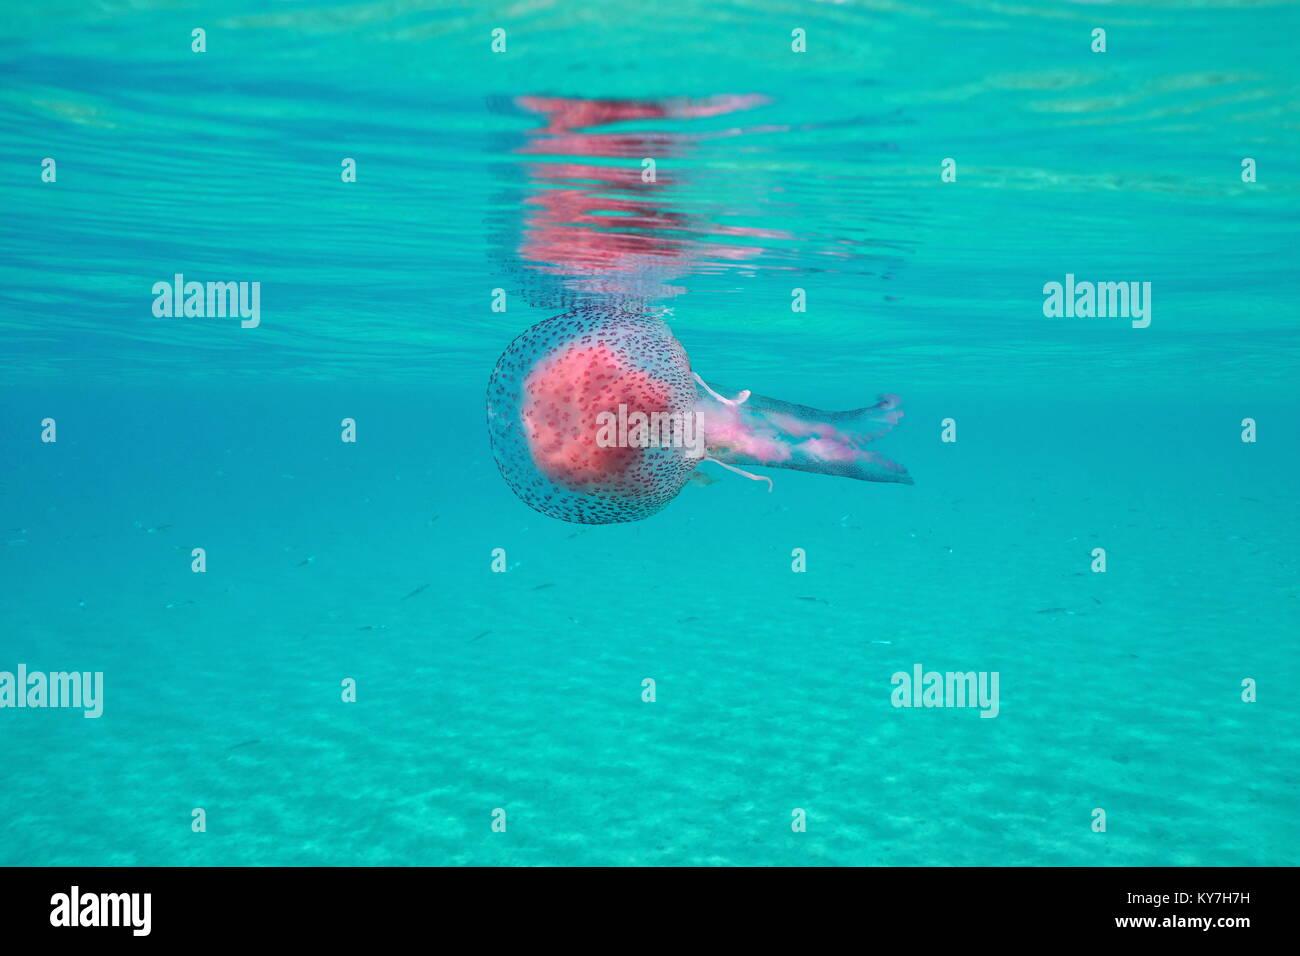 Quallen unter Wasser Oberfläche im Mittelmeer, mauve Stinger Pelagia noctiluca, Spanien, Costa Brava Stockbild